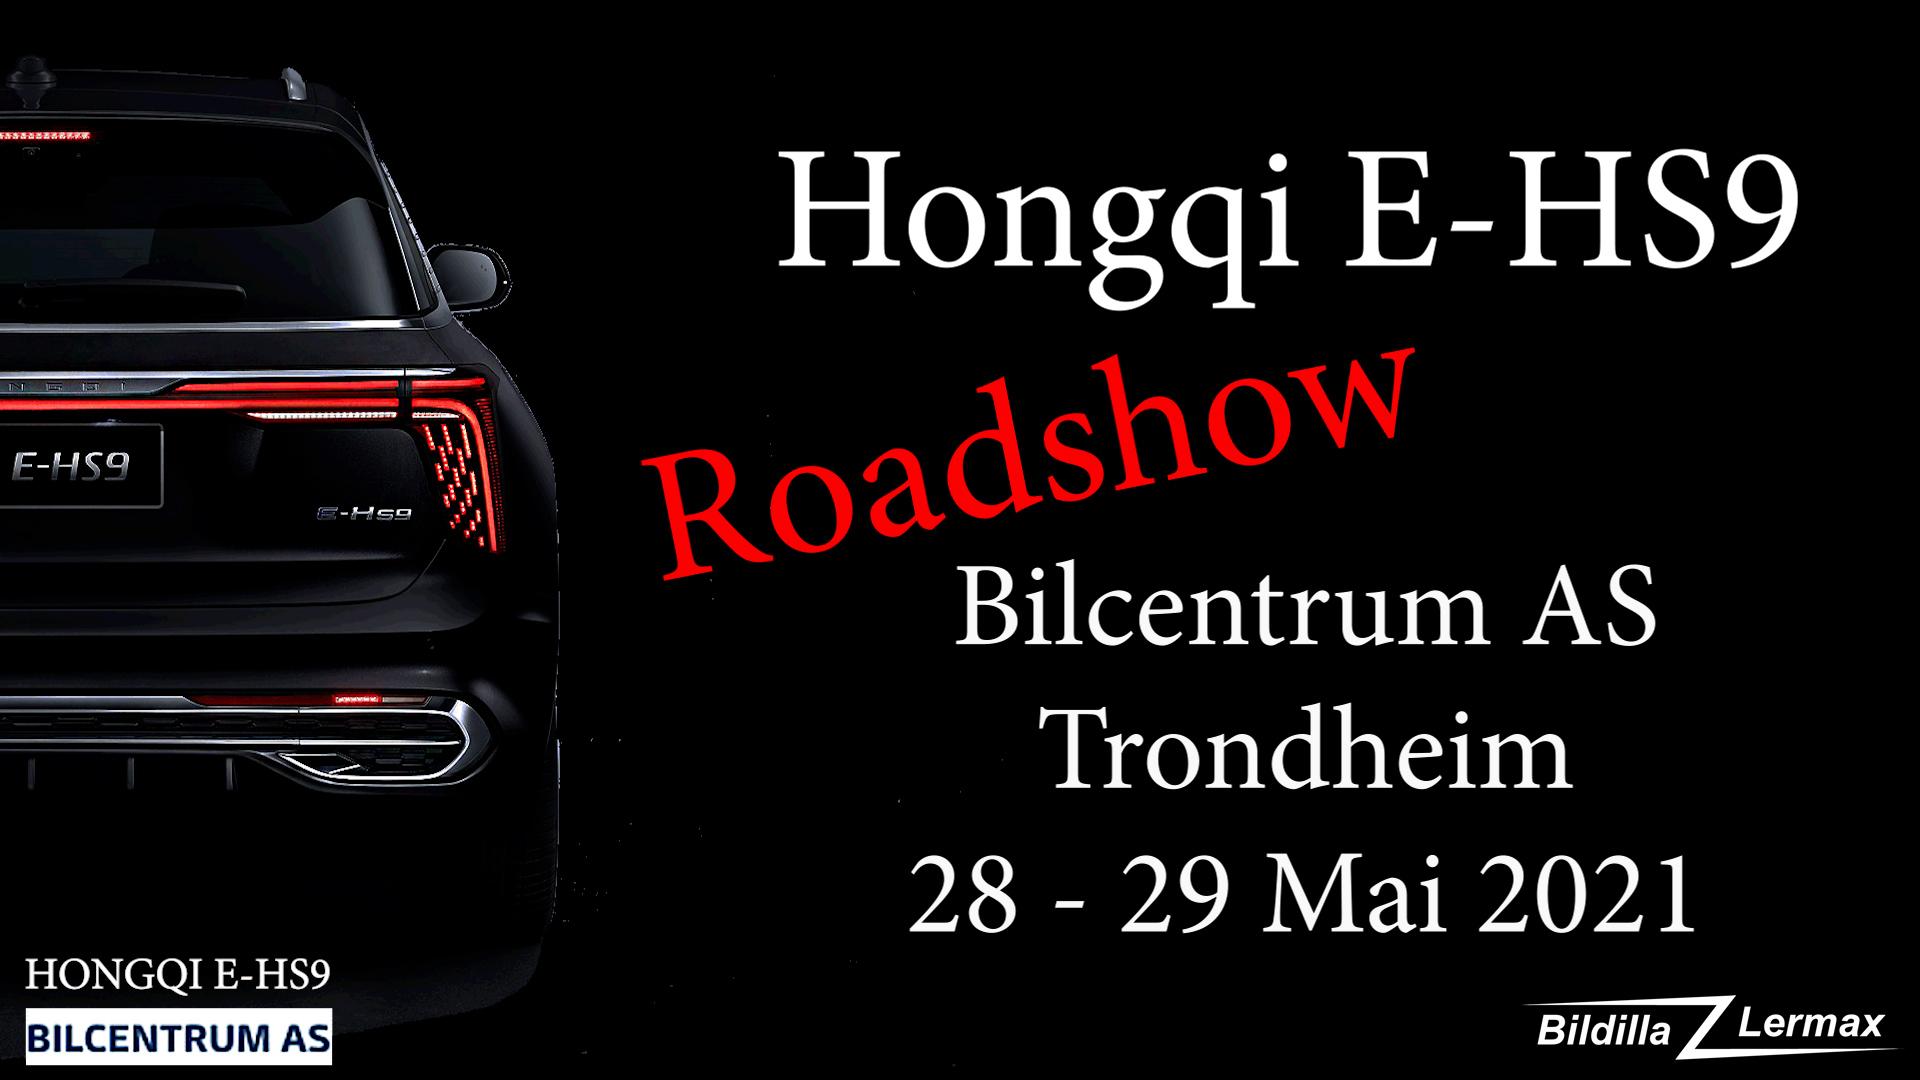 HONGQI E-HS9 Roadshow